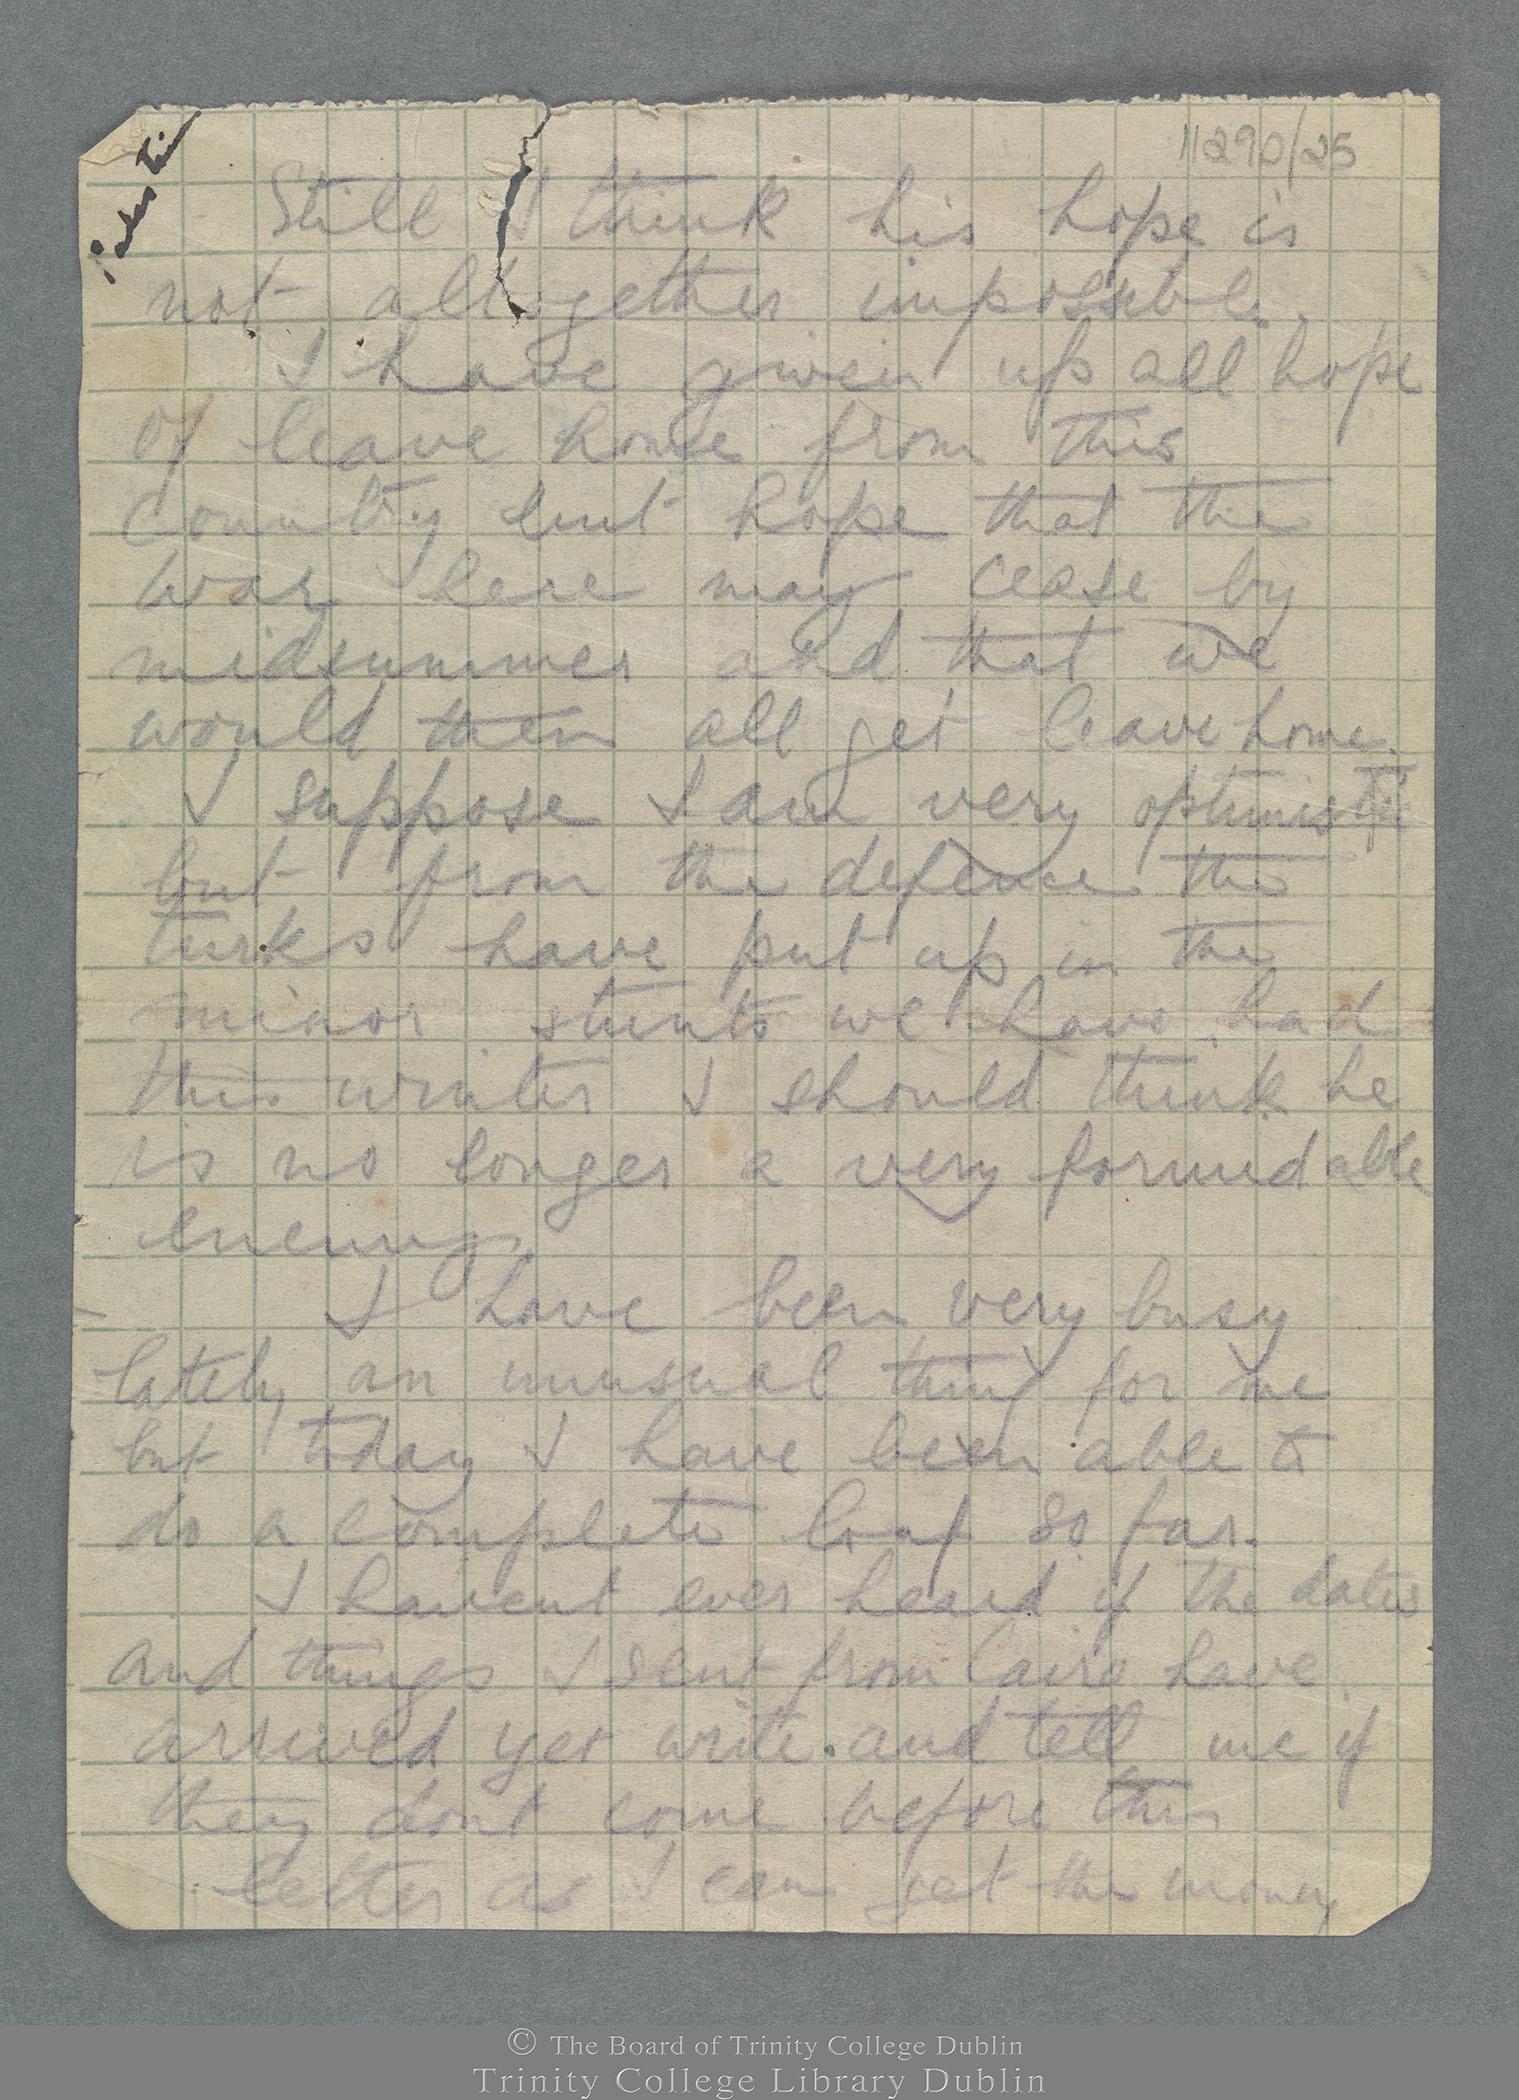 TCD MS 11290/25 folio 2 recto